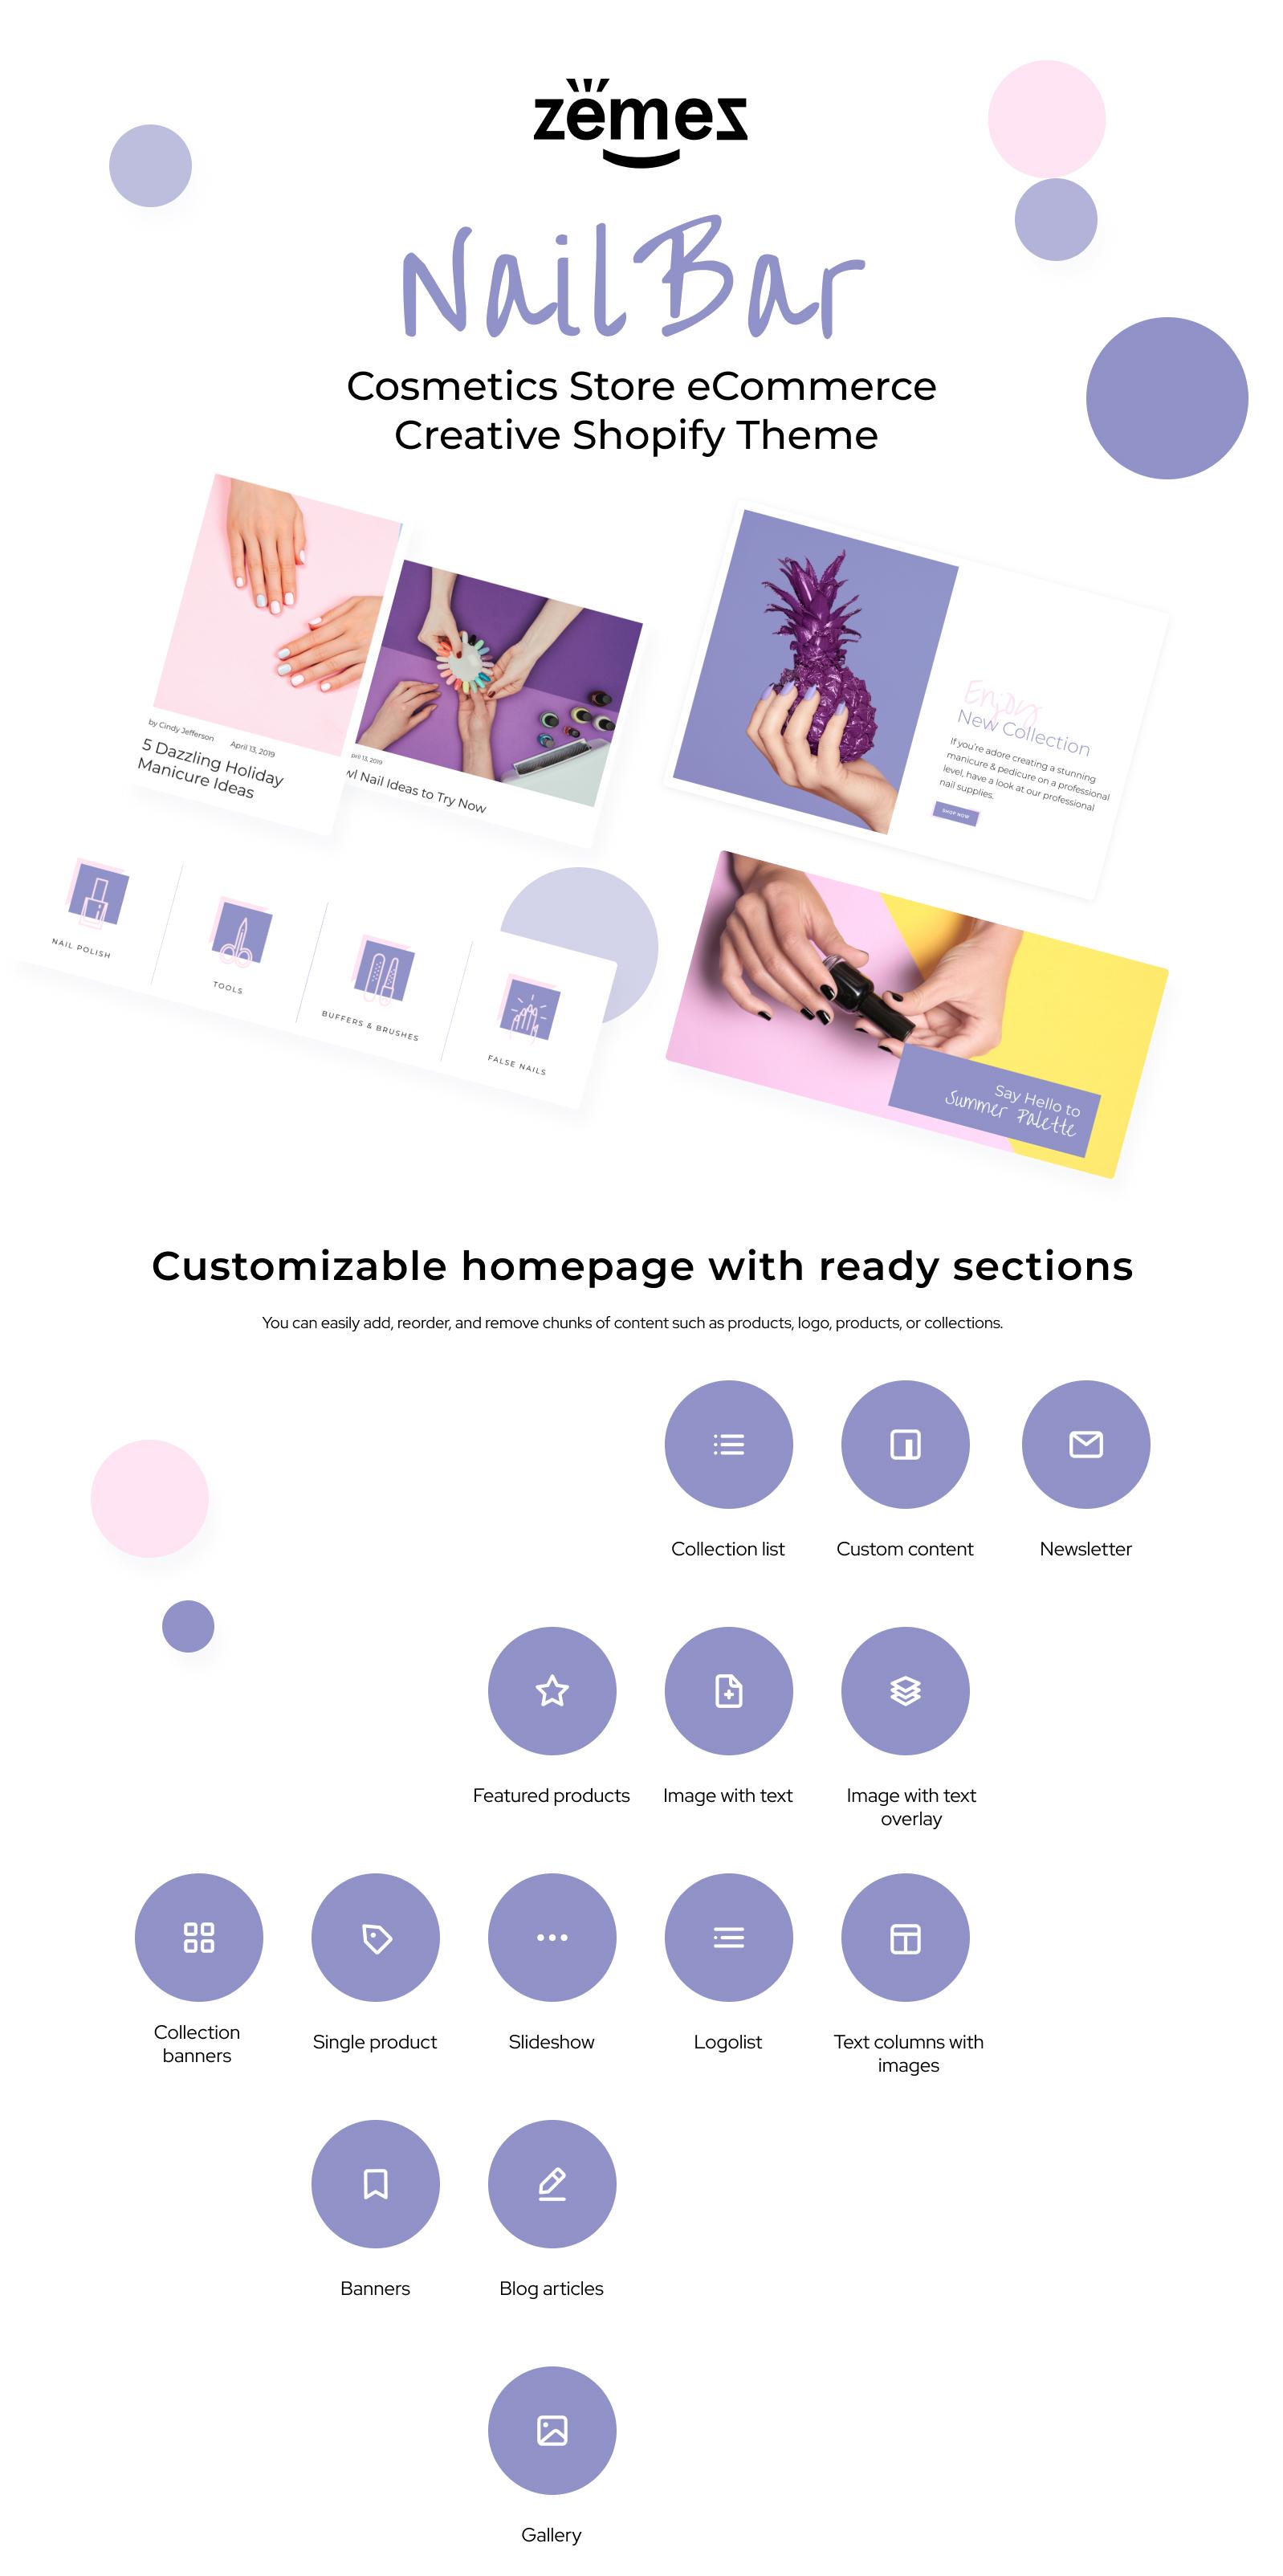 Nail Bar - Cosmetics Store eCommerce Creative Shopify Theme